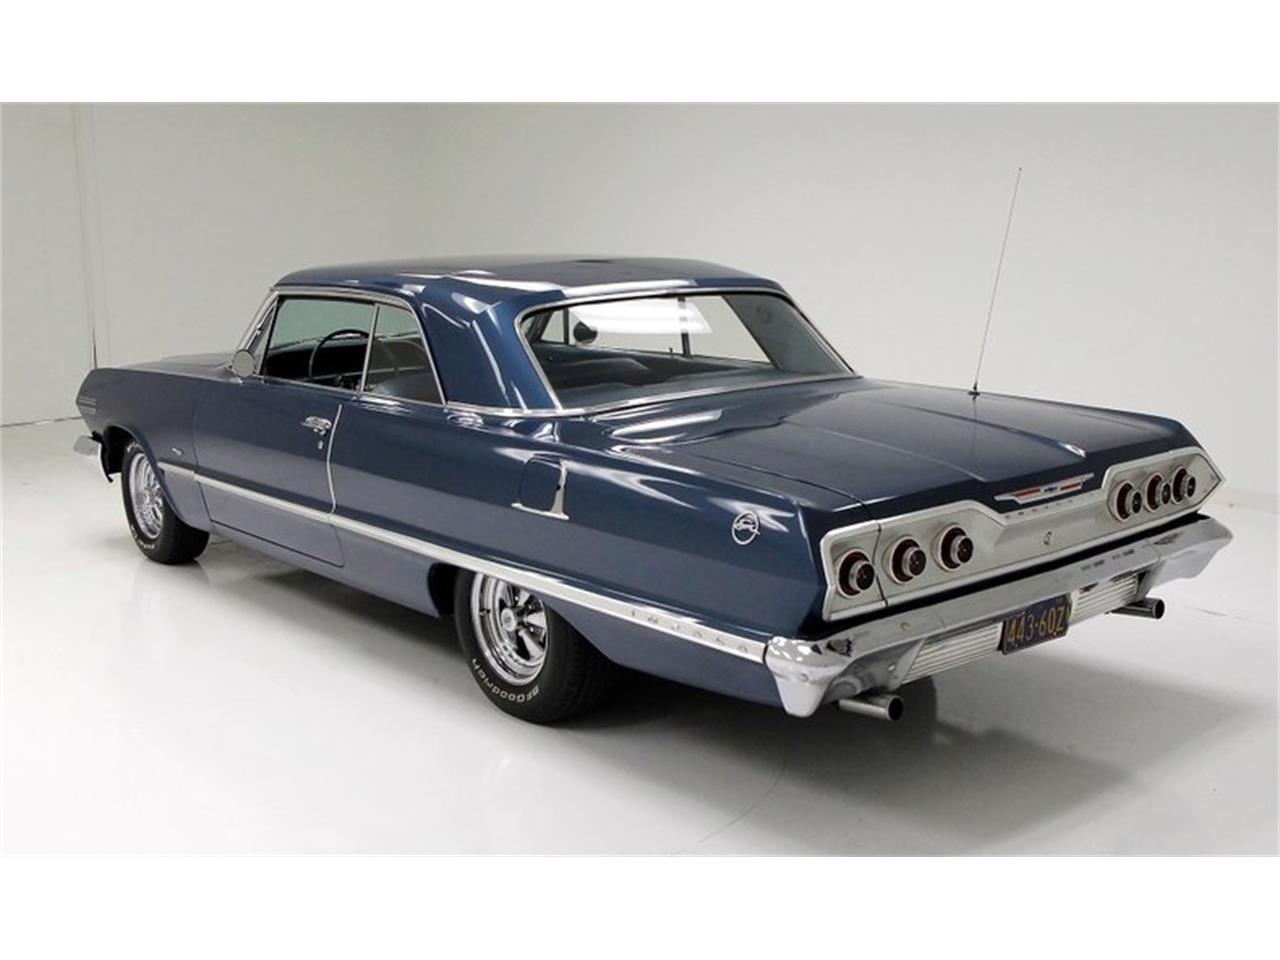 1963 Chevrolet Impala (CC-1242973) for sale in Morgantown, Pennsylvania